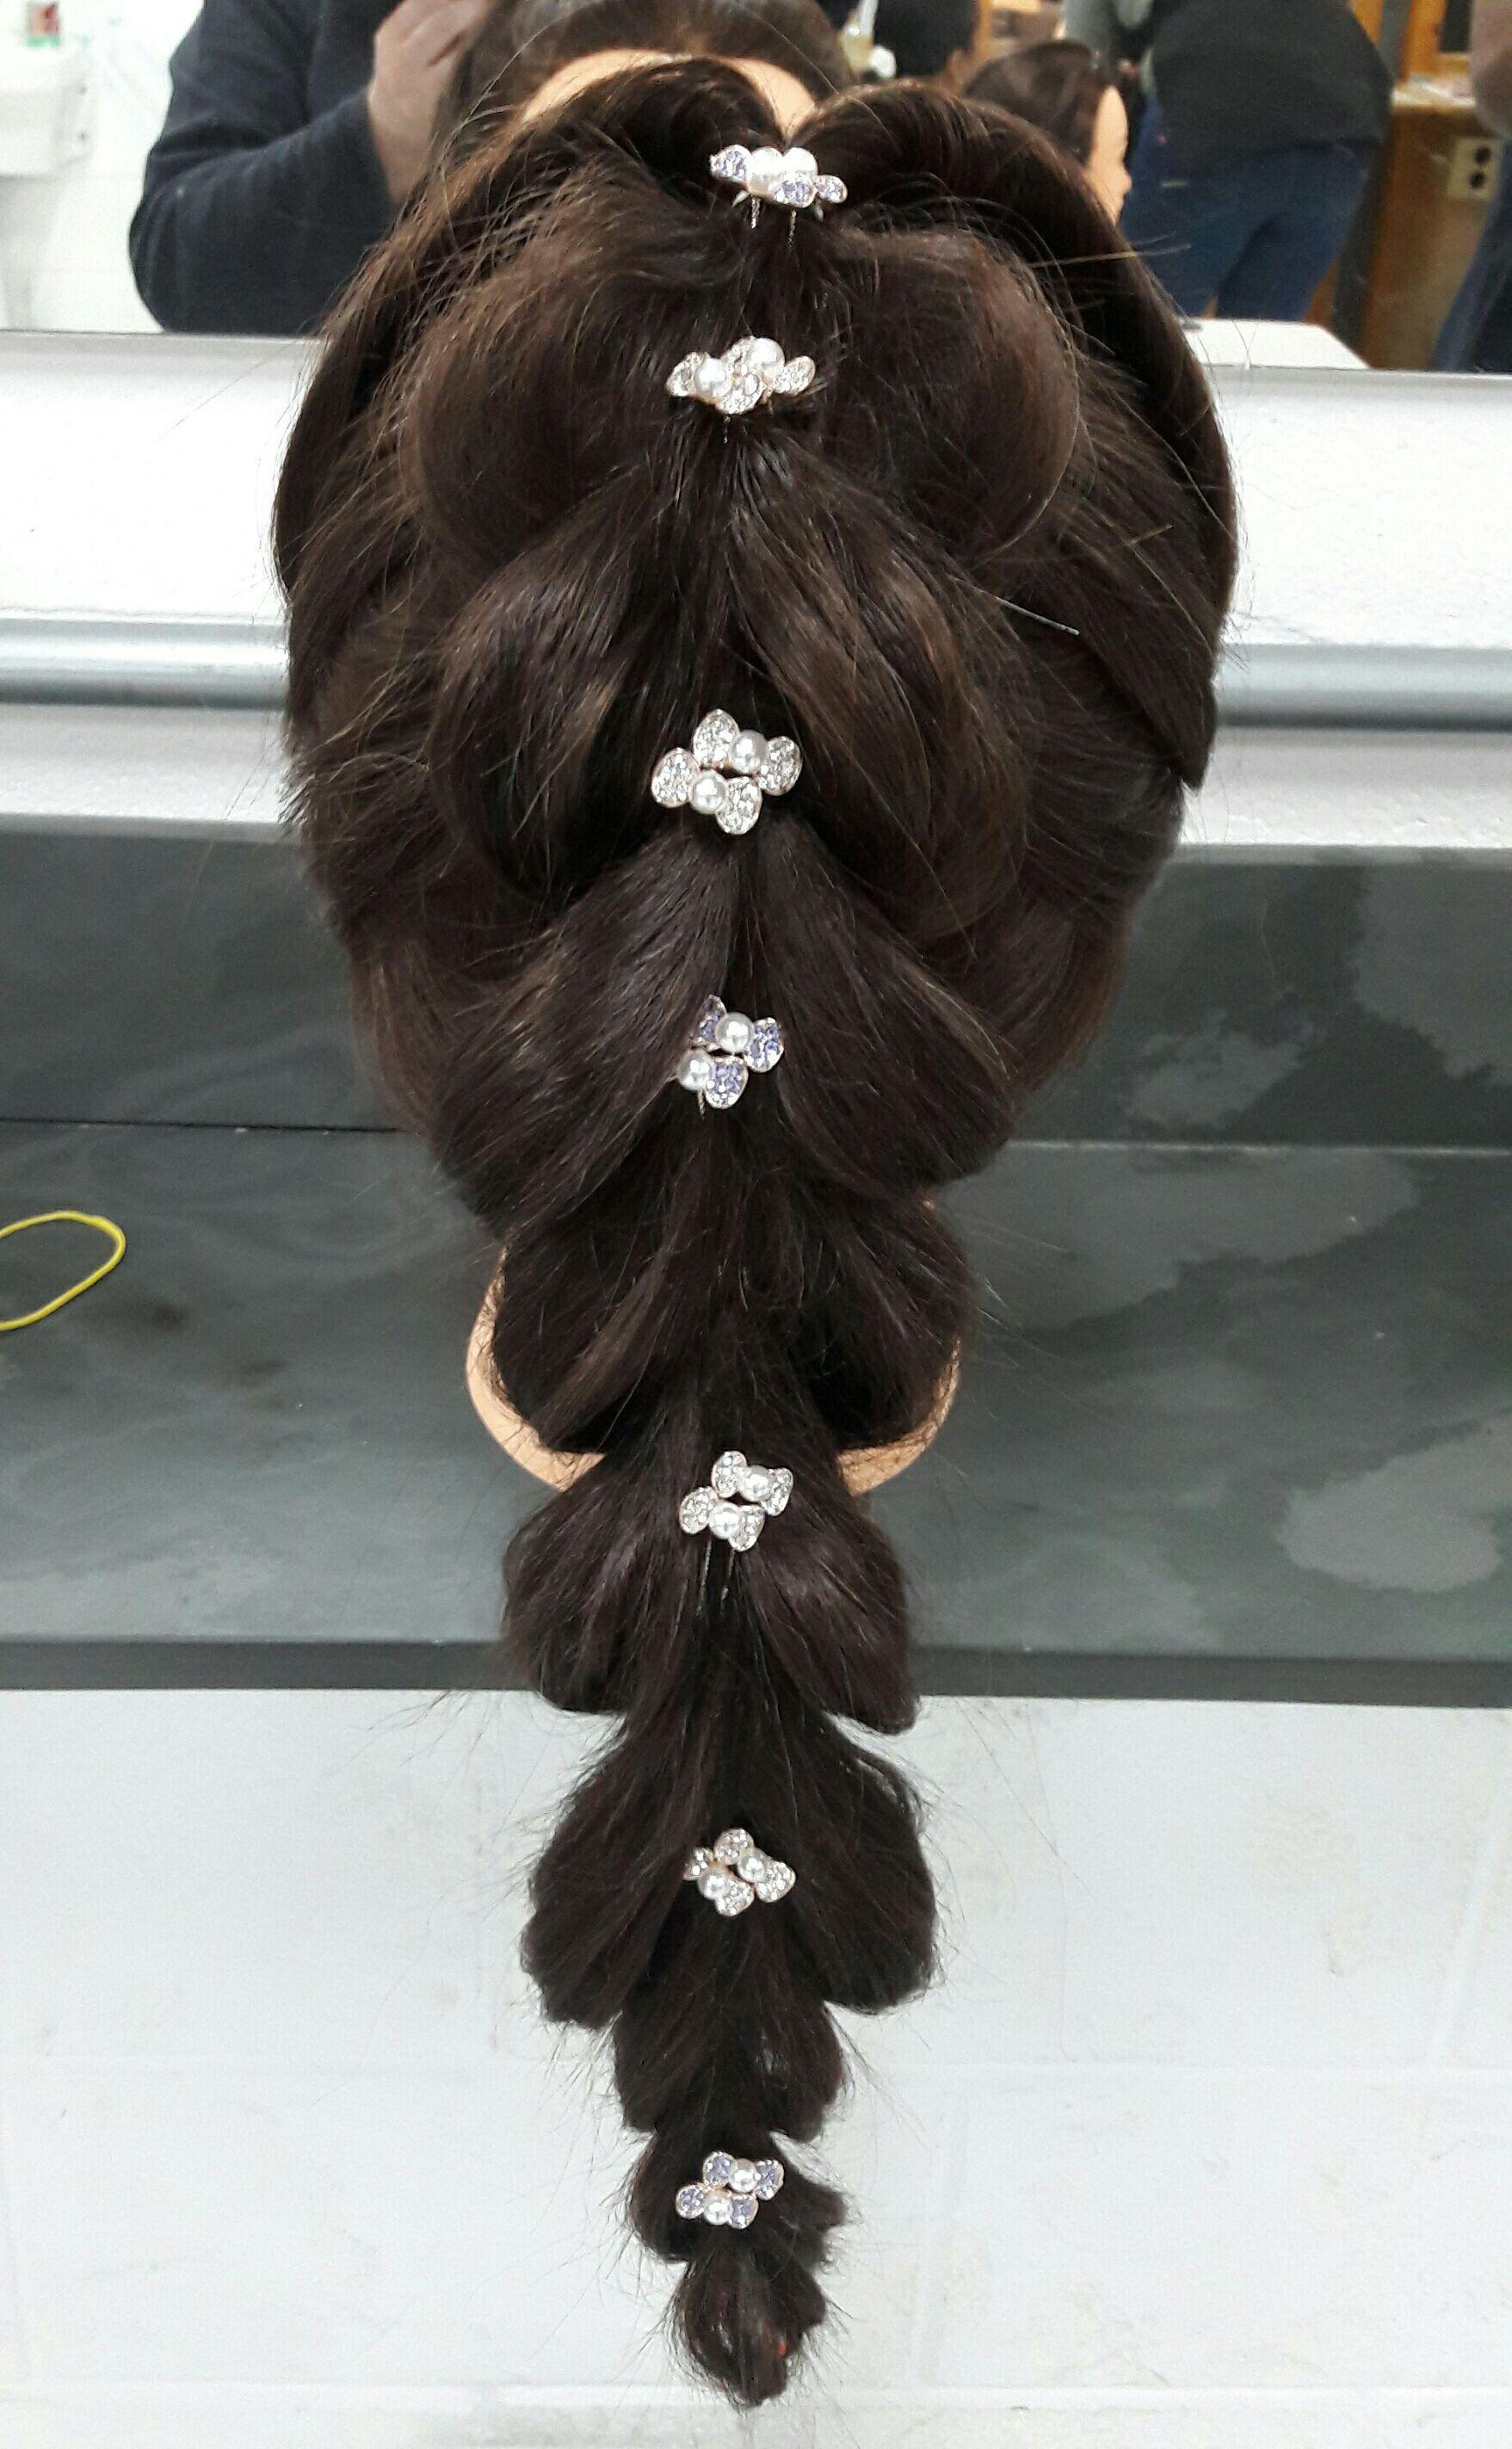 cabelo manicure e pedicure manicure e pedicure cabeleireiro(a) auxiliar cabeleireiro(a)